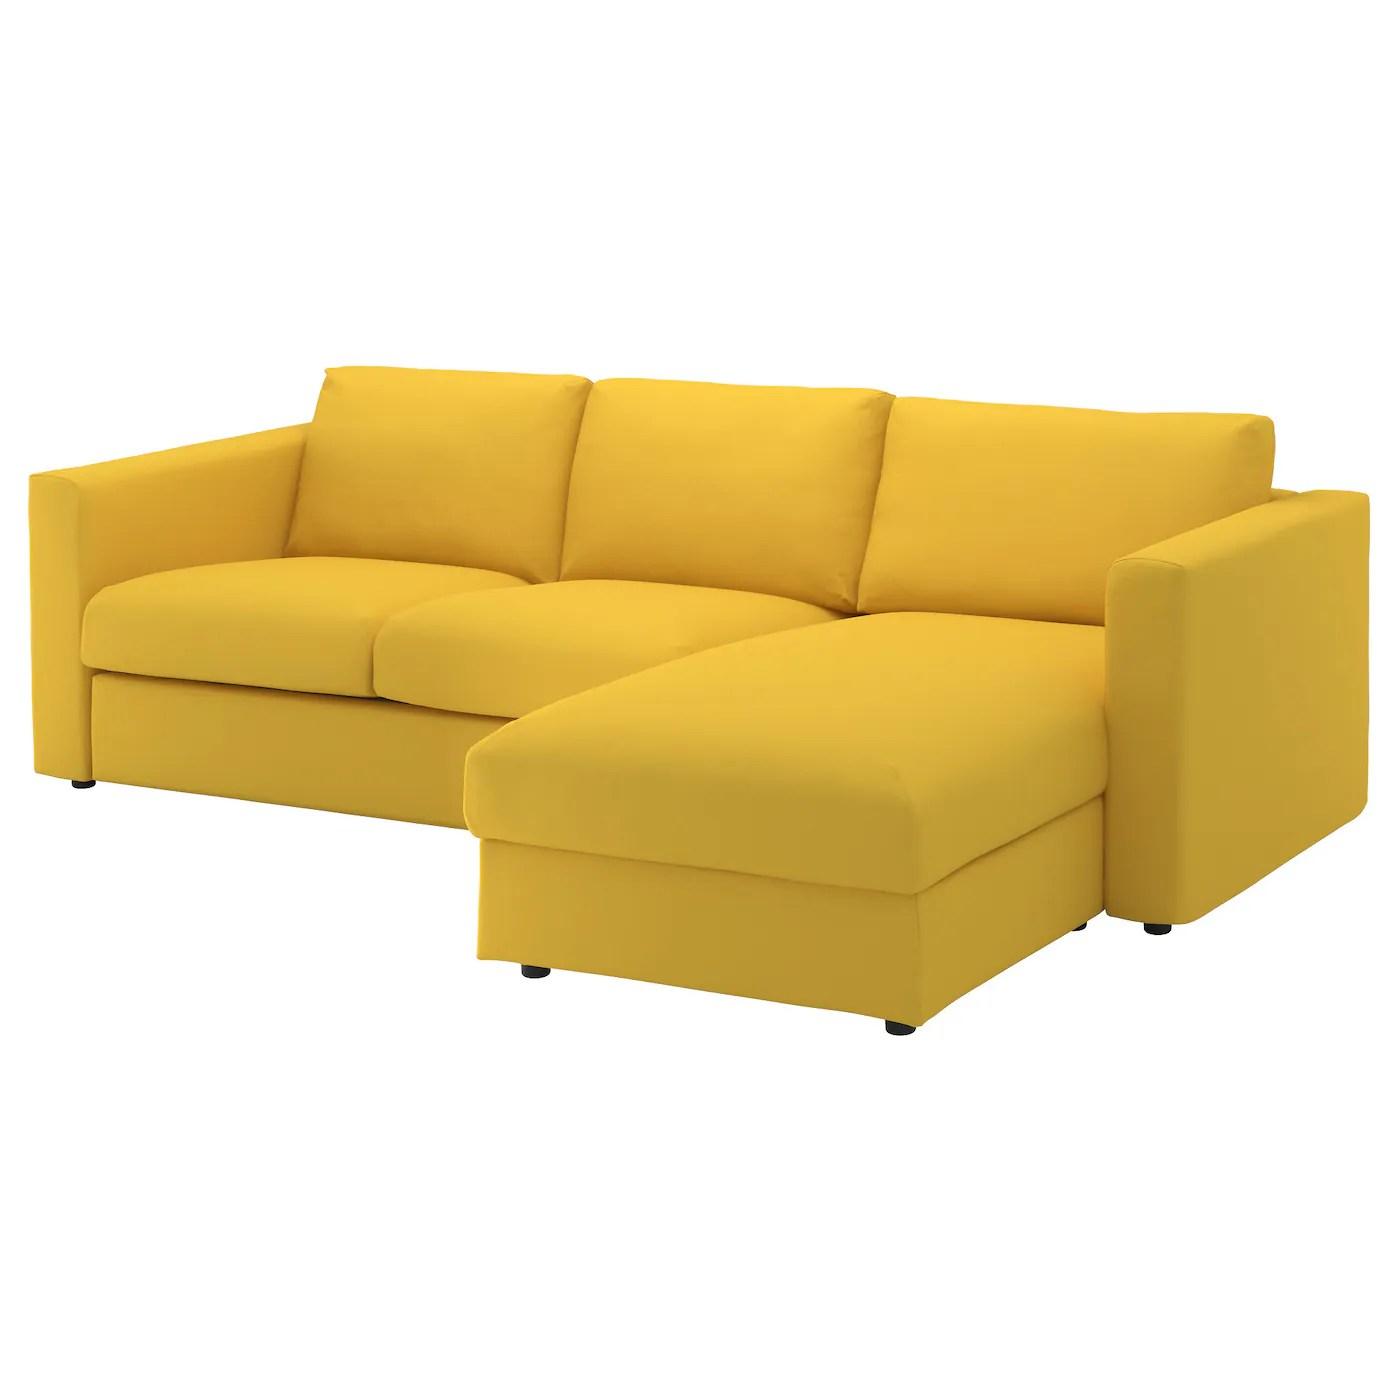 yellow sofa bed ikea costco chair fabric sofas ireland dublin